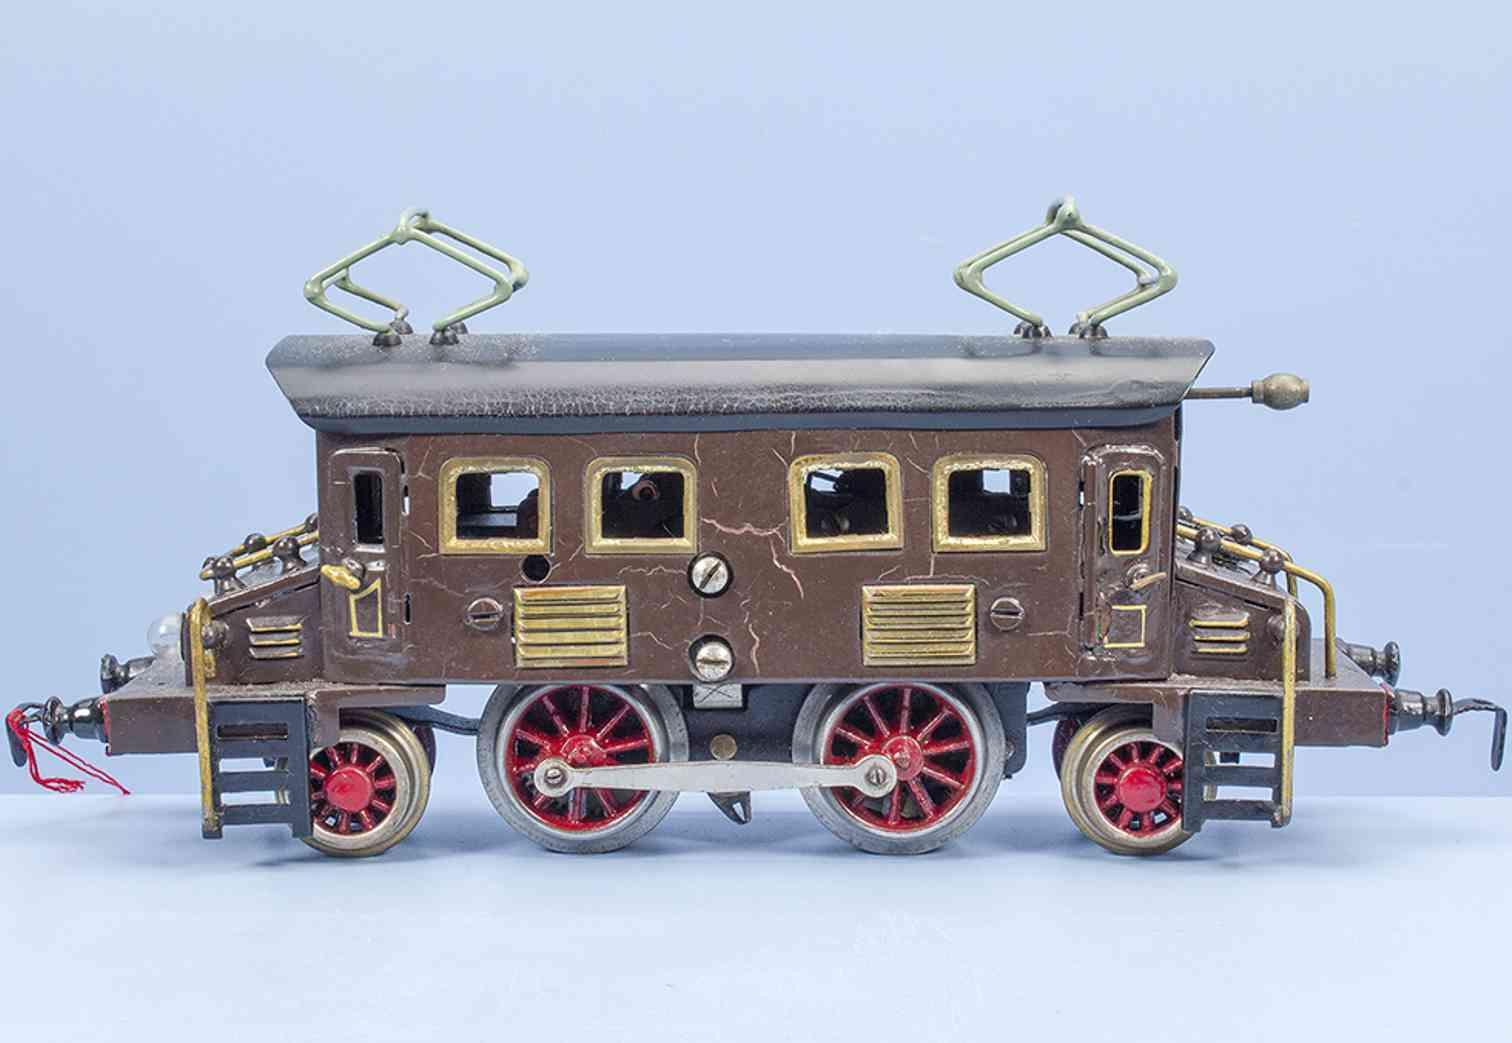 kraus-fandor 1028/18 1928 eisenbahn 20 volt vollbahnlokomotive braun spur 0